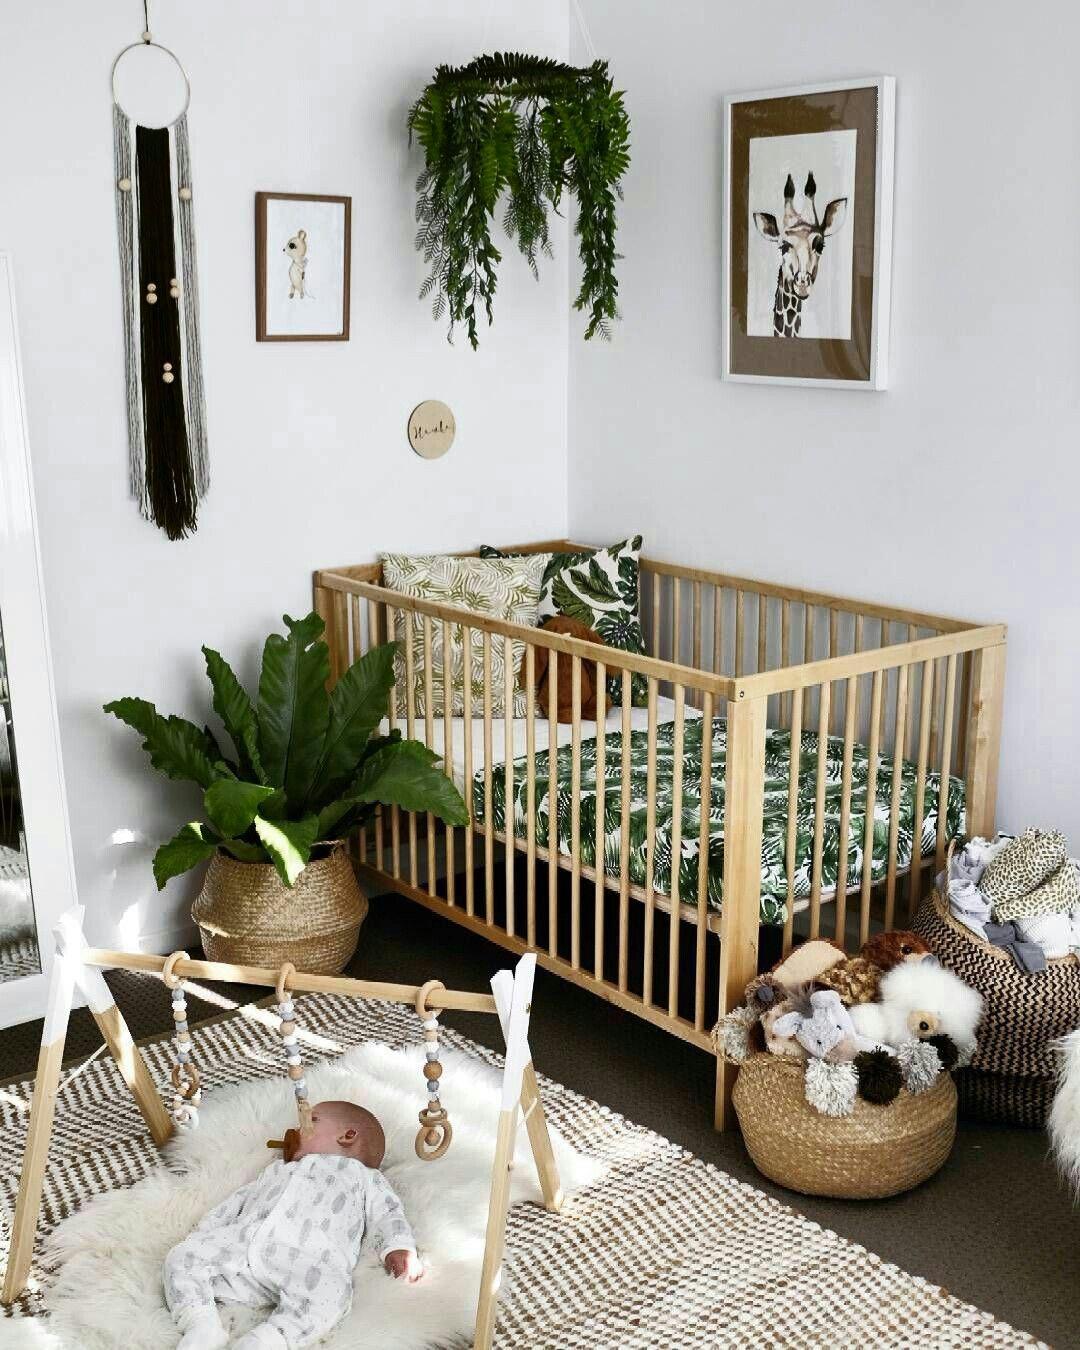 Pin By Laetitia Diboty On Bebek Cocuk Nursery Baby Room Decor Bedroom